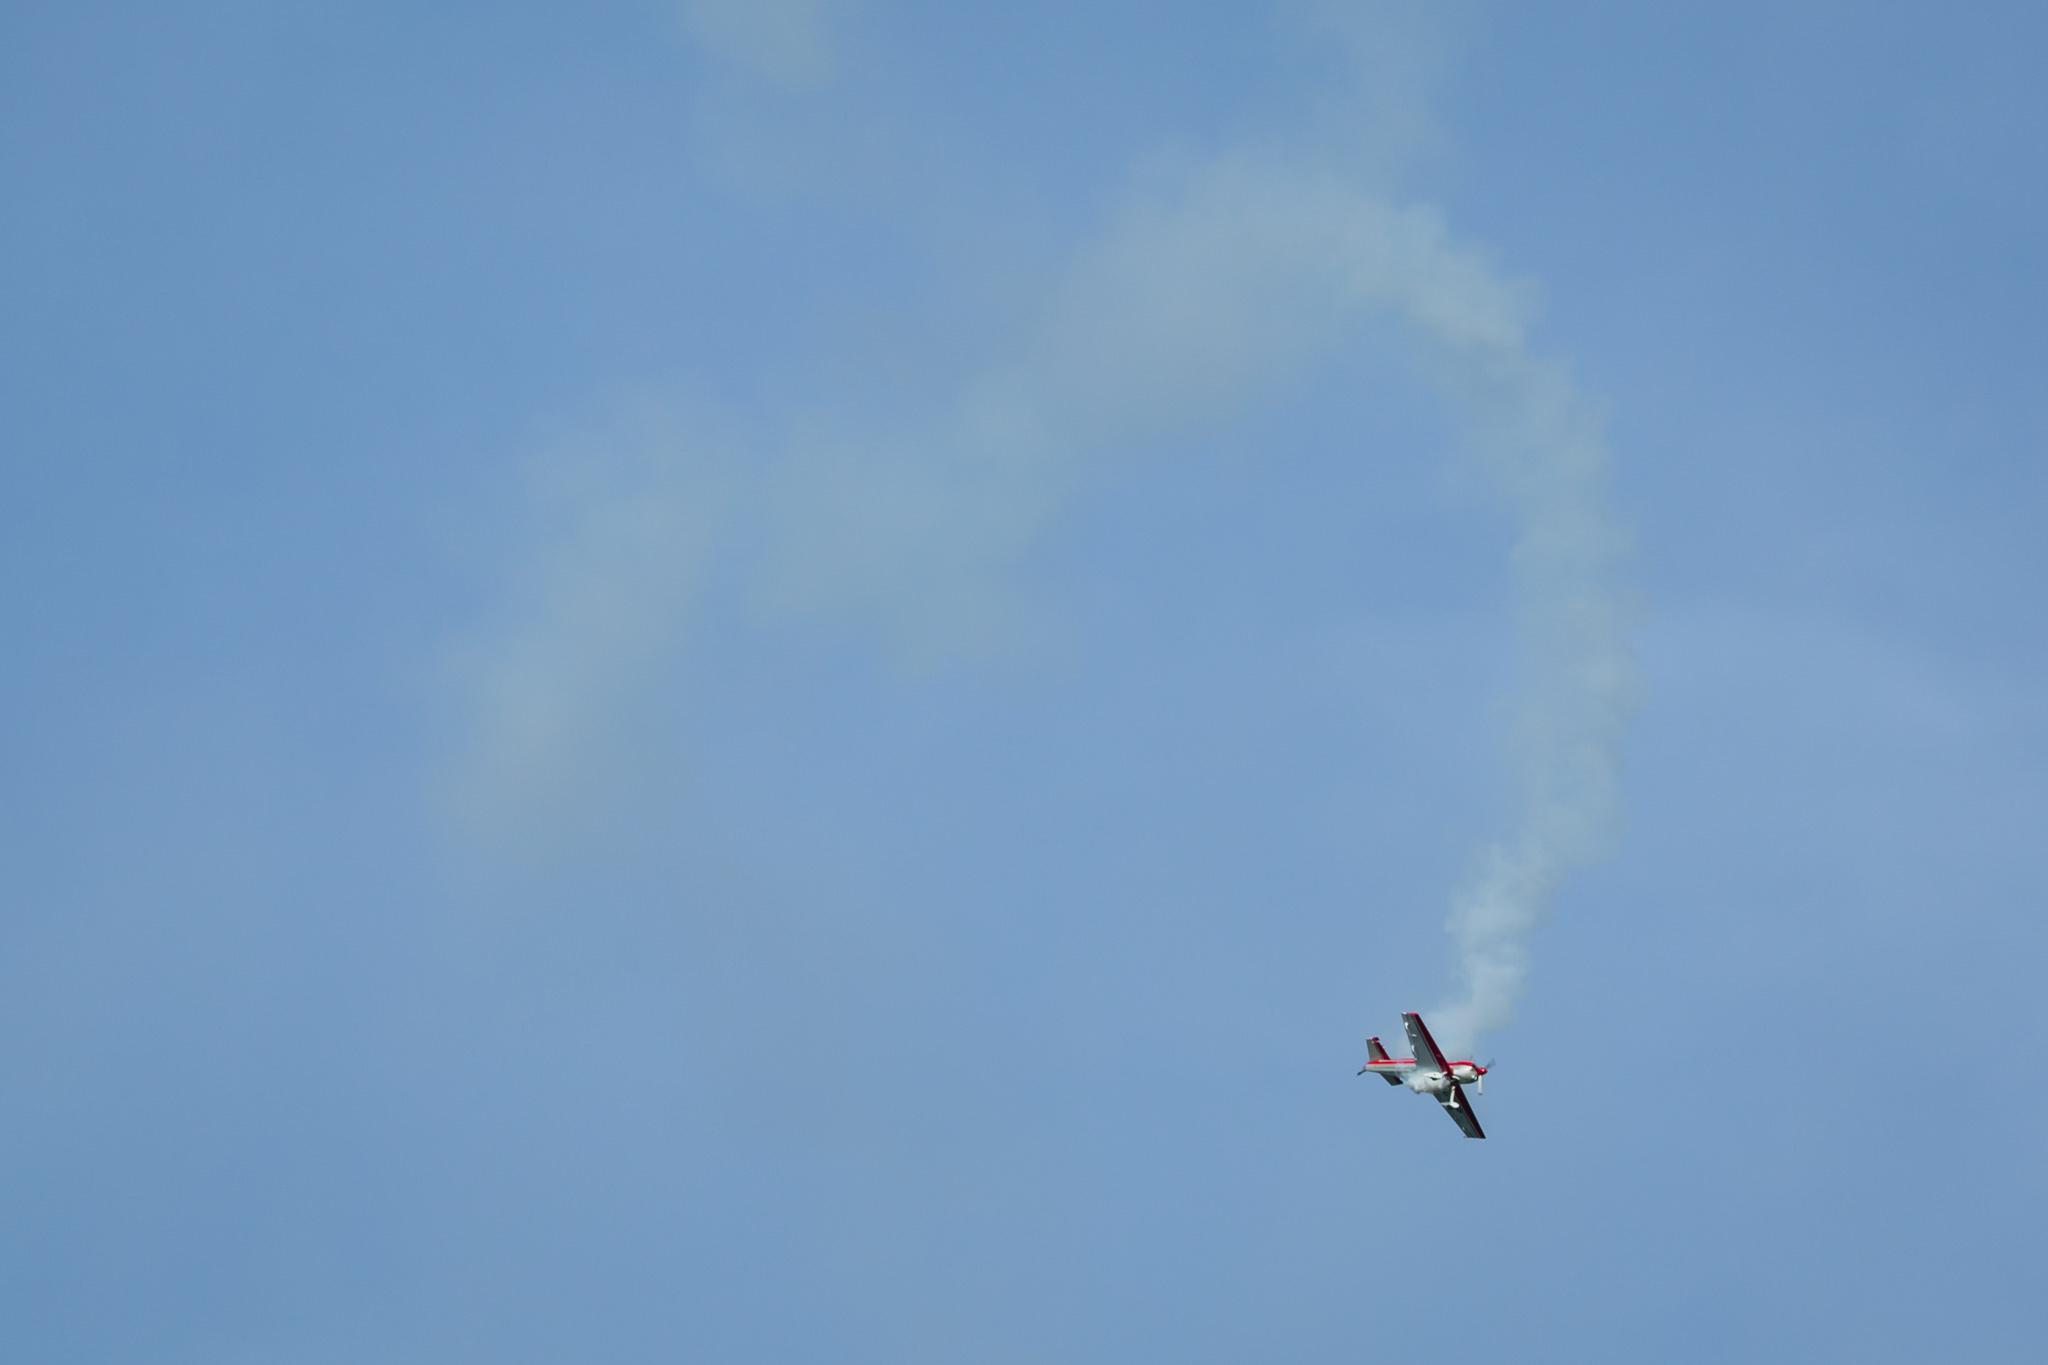 A stunt plane